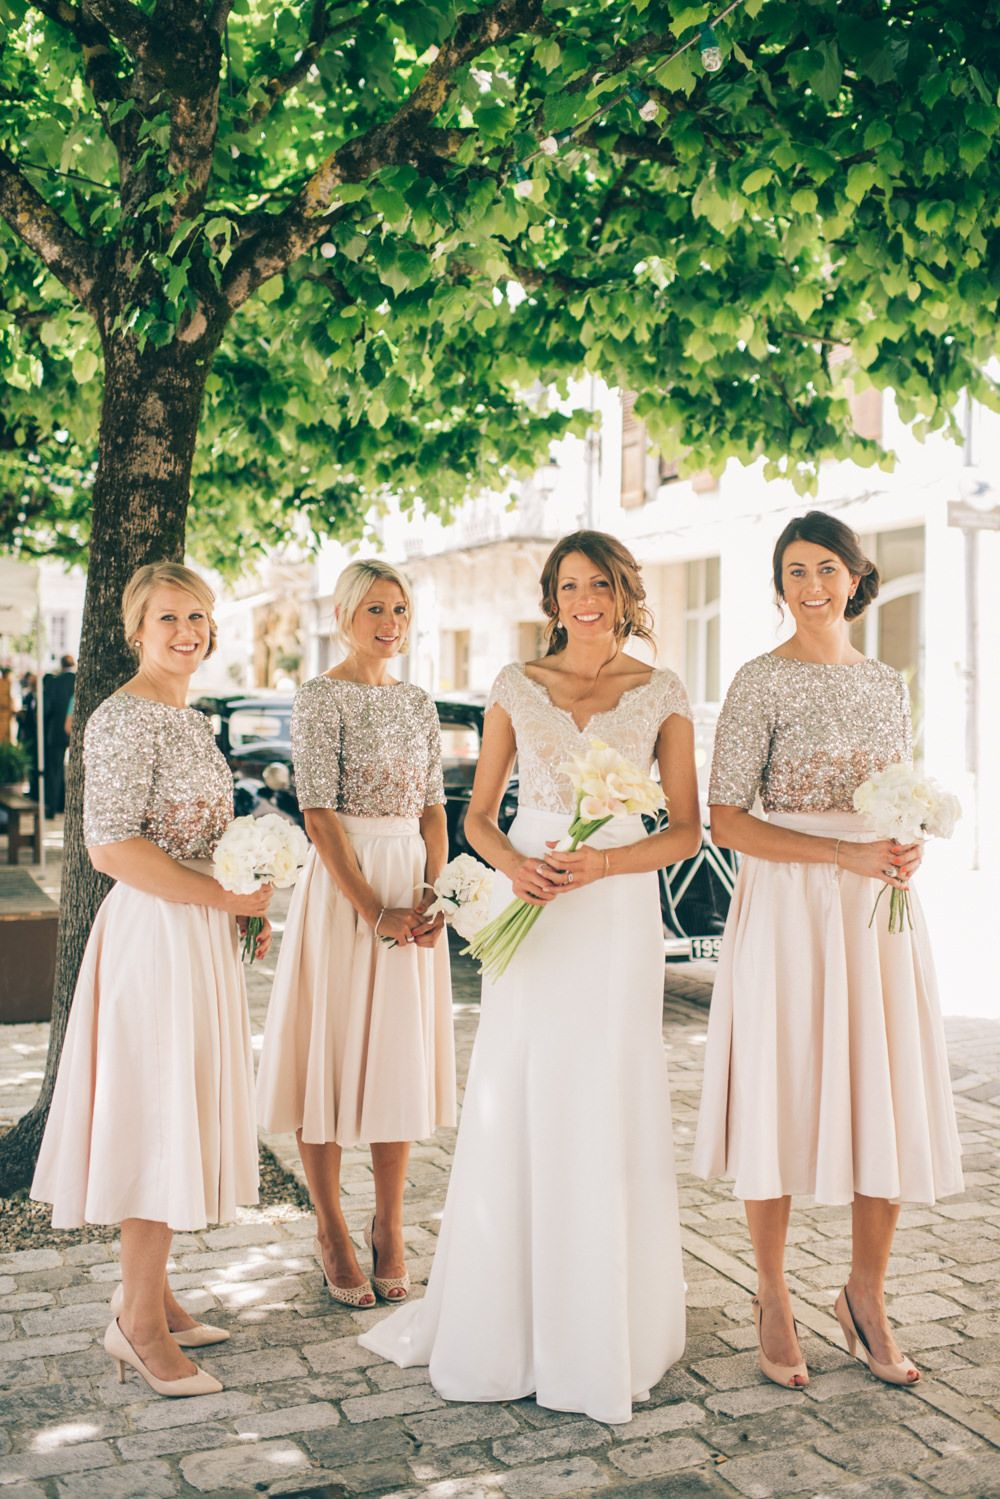 a3ab031b03 Bride & Bridesmaids in Bespoke Blush Skirts & Sequin Coast Tops - Annabel  Staff Wedding Photography